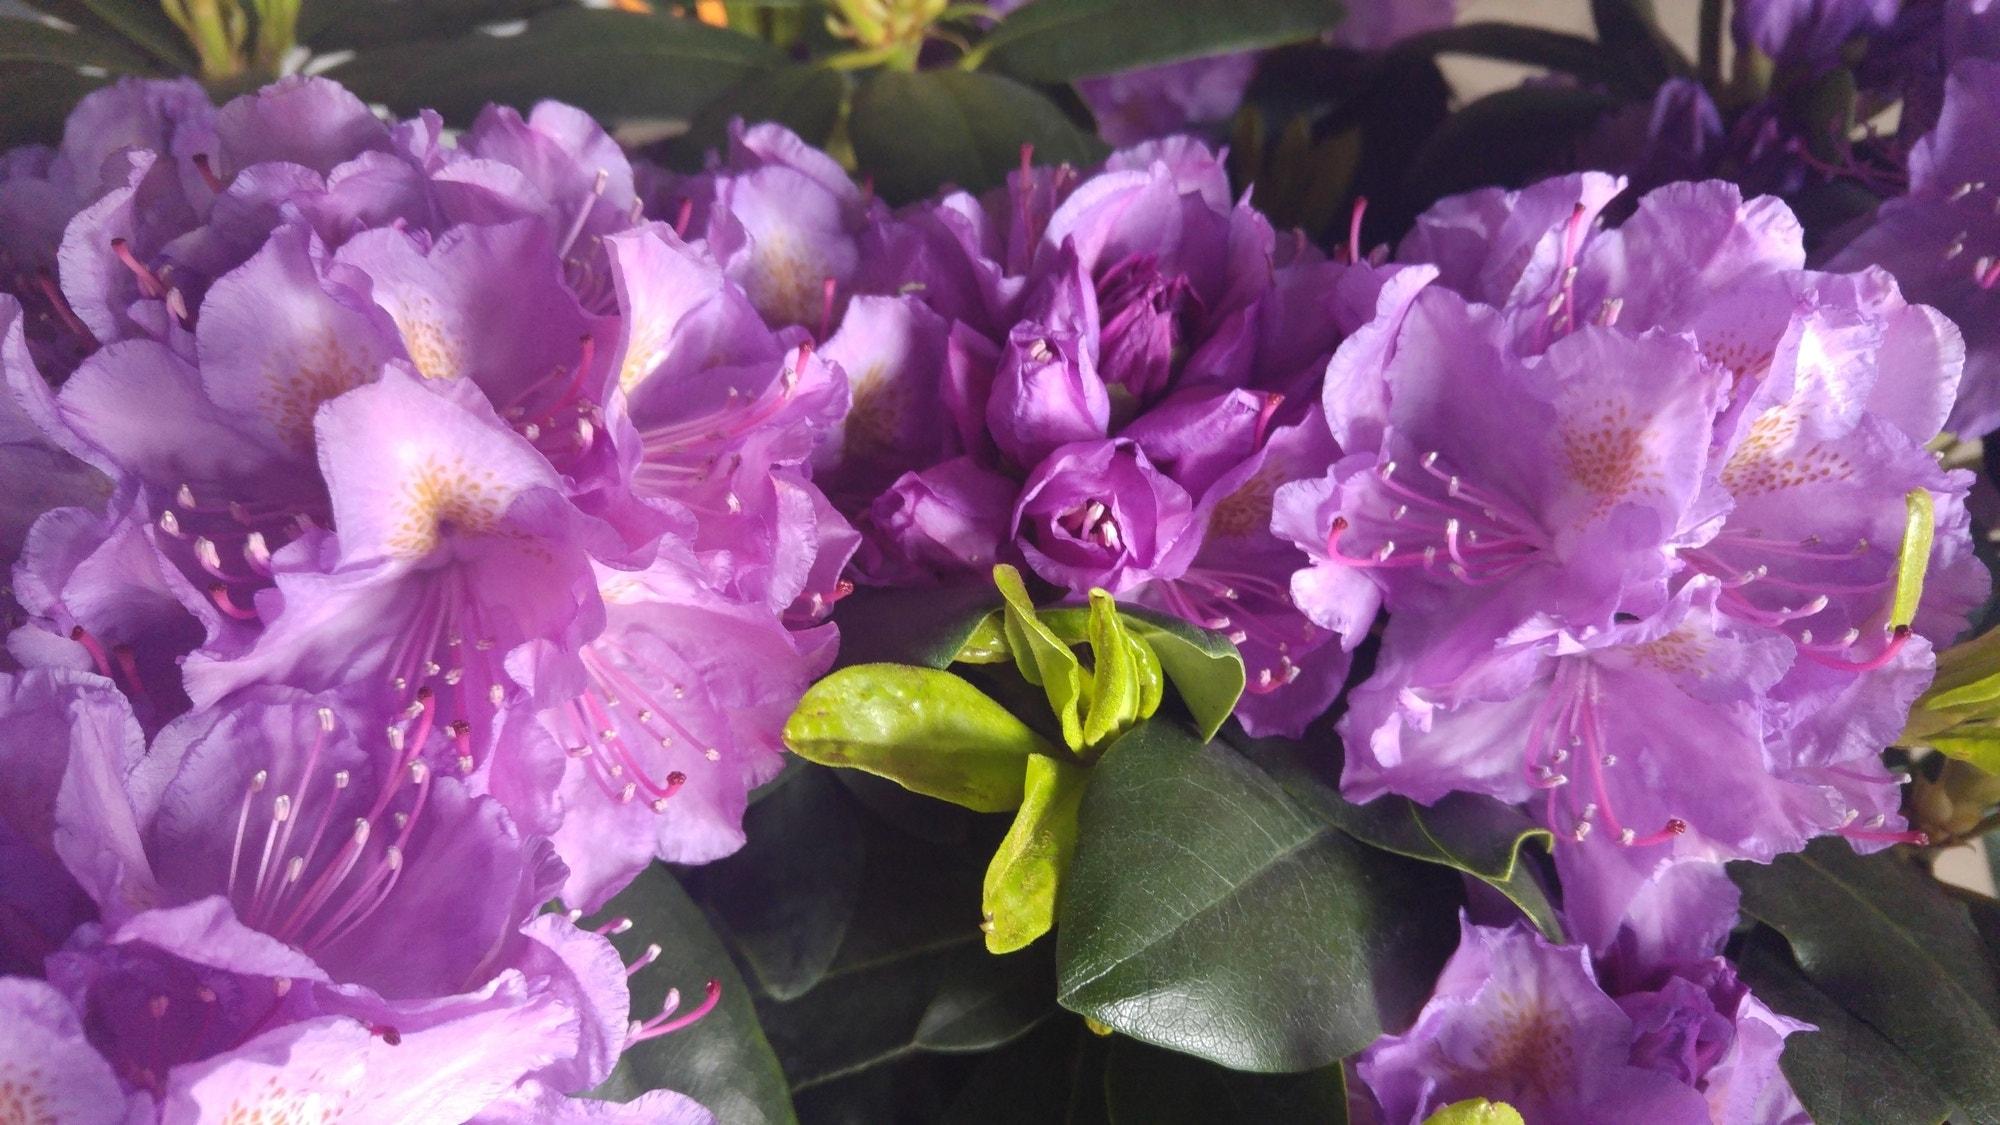 Rhododendron (Rhododendron catawbiense 'Grandiflorum')-Plant in pot-50/60 cm